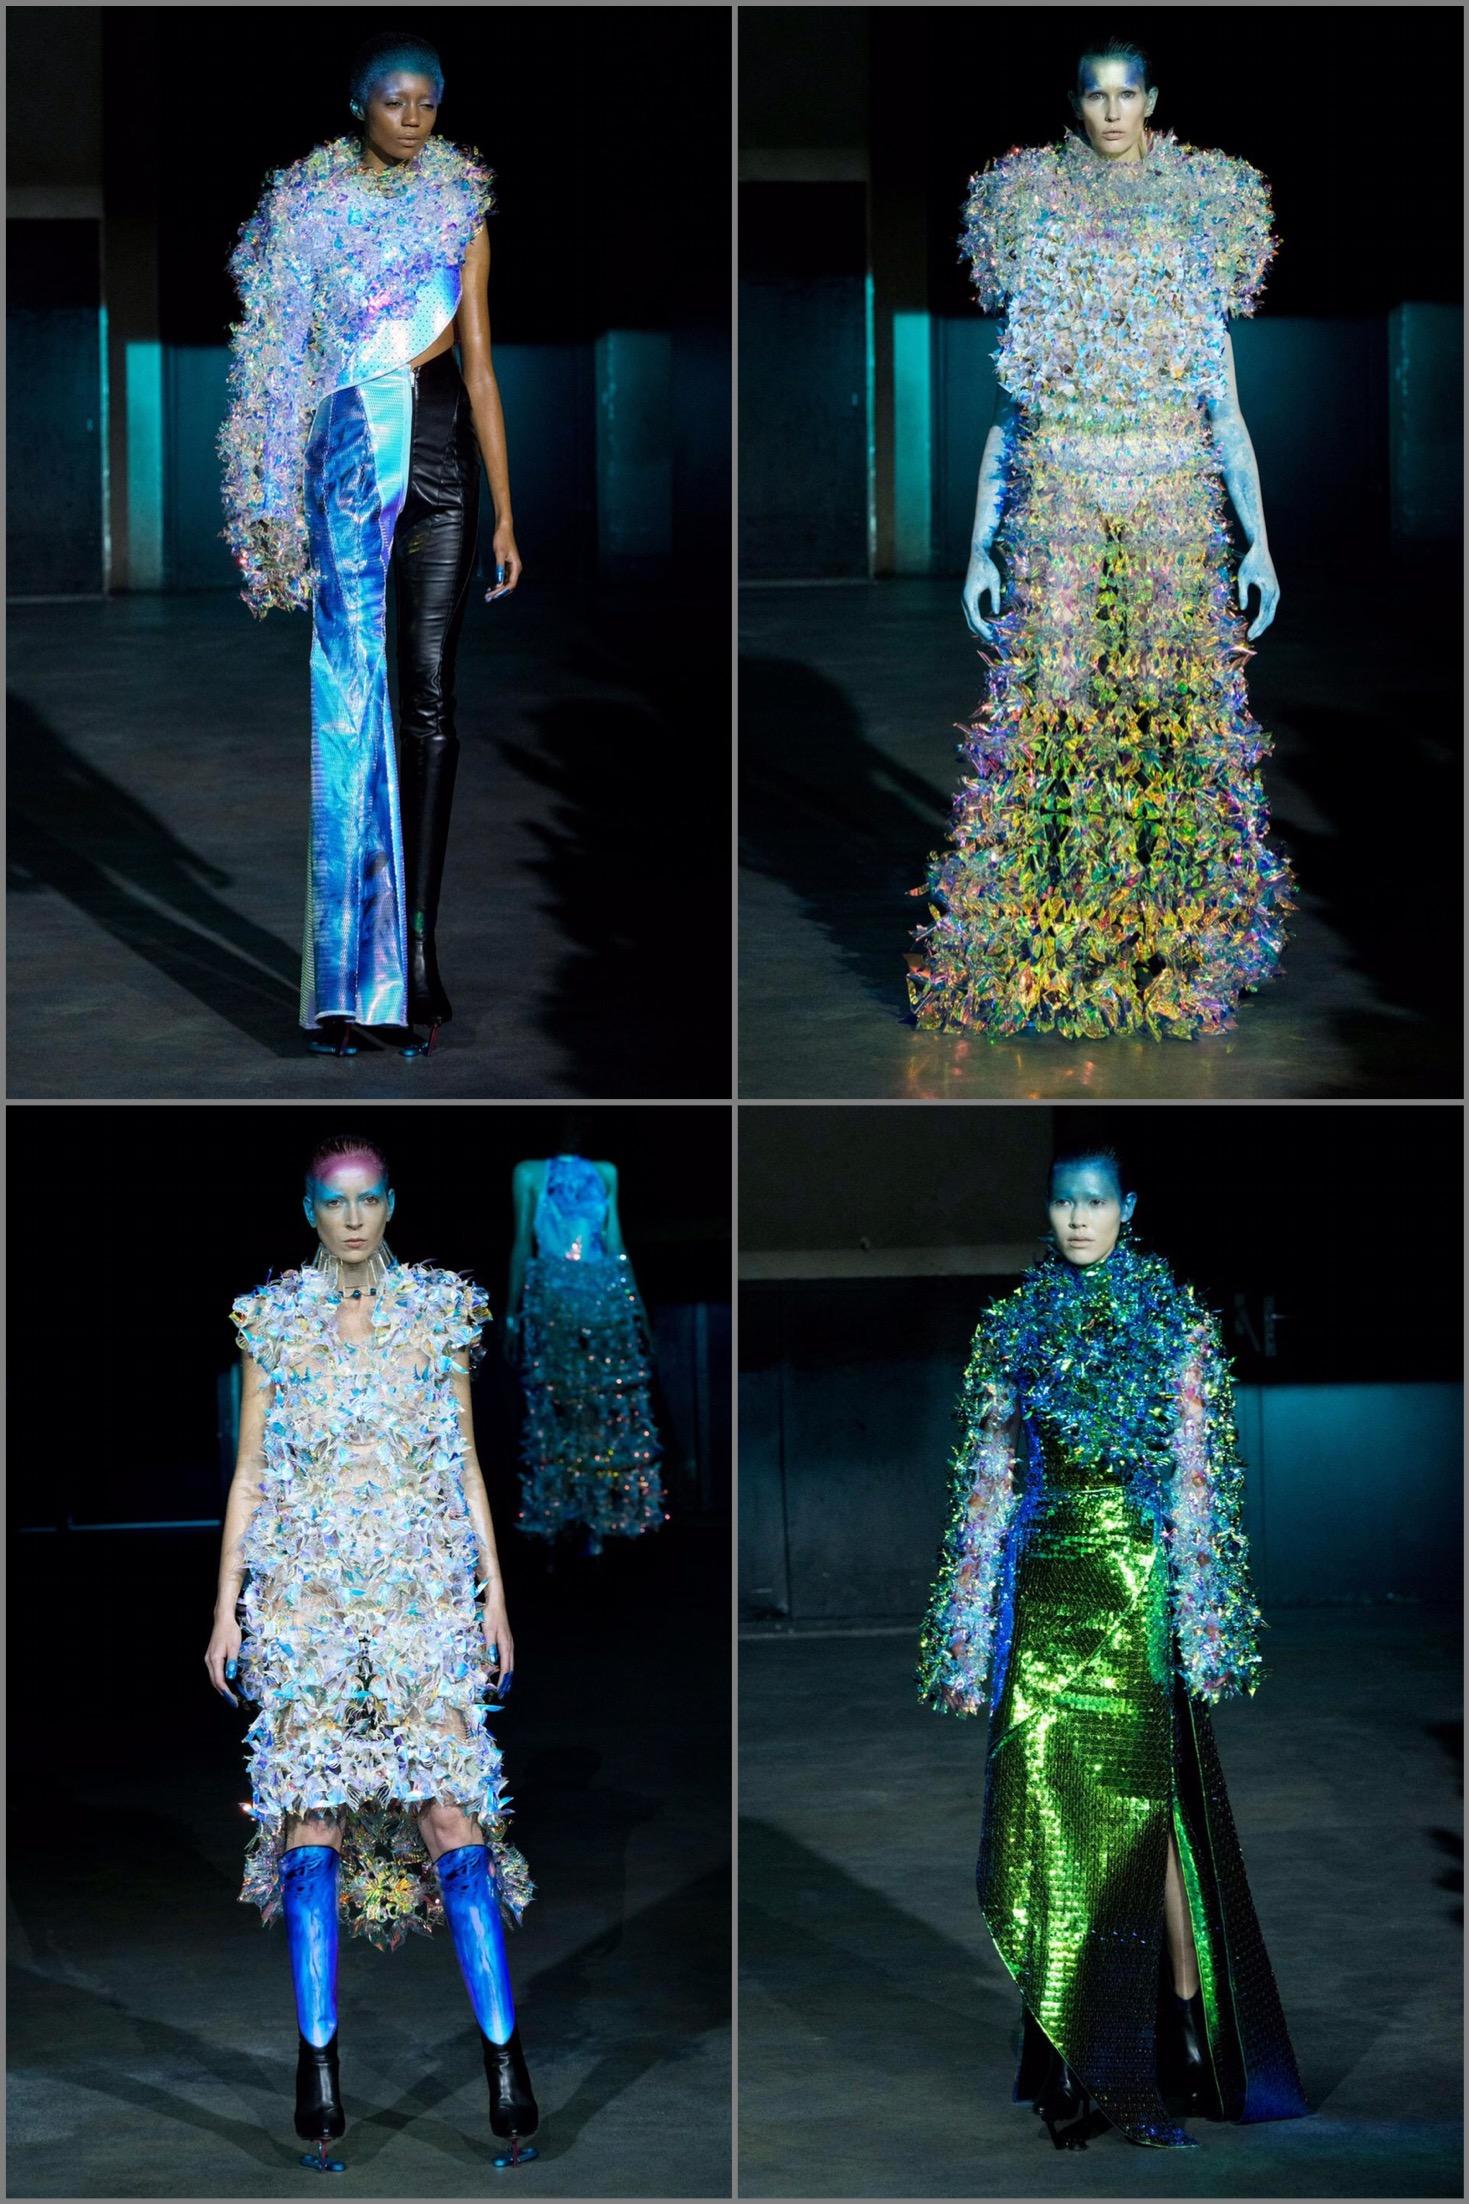 Paris Couture Week Fall Winter 2016-2017 - Yuima Nakazato